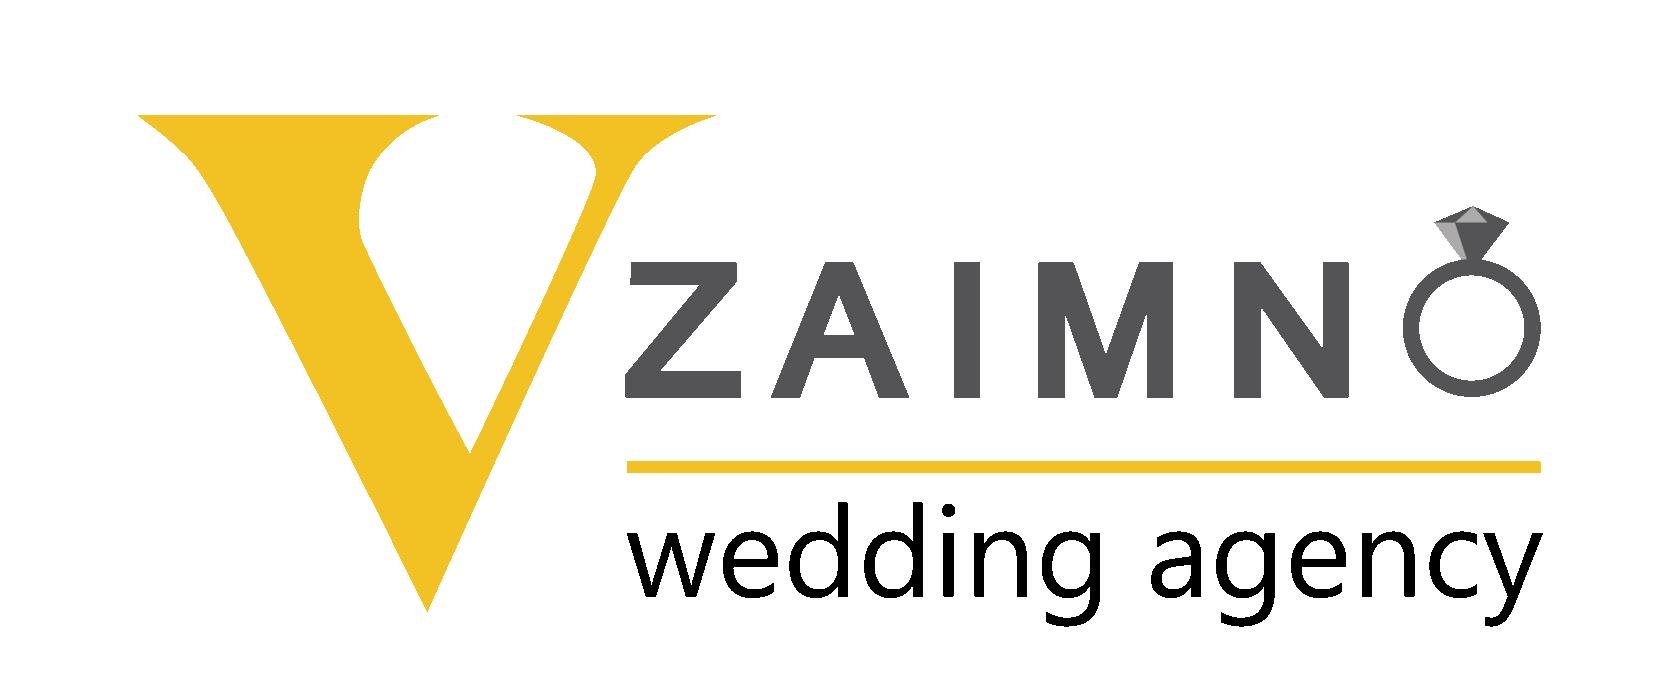 Свадебное агентство Vzaimno Wedding